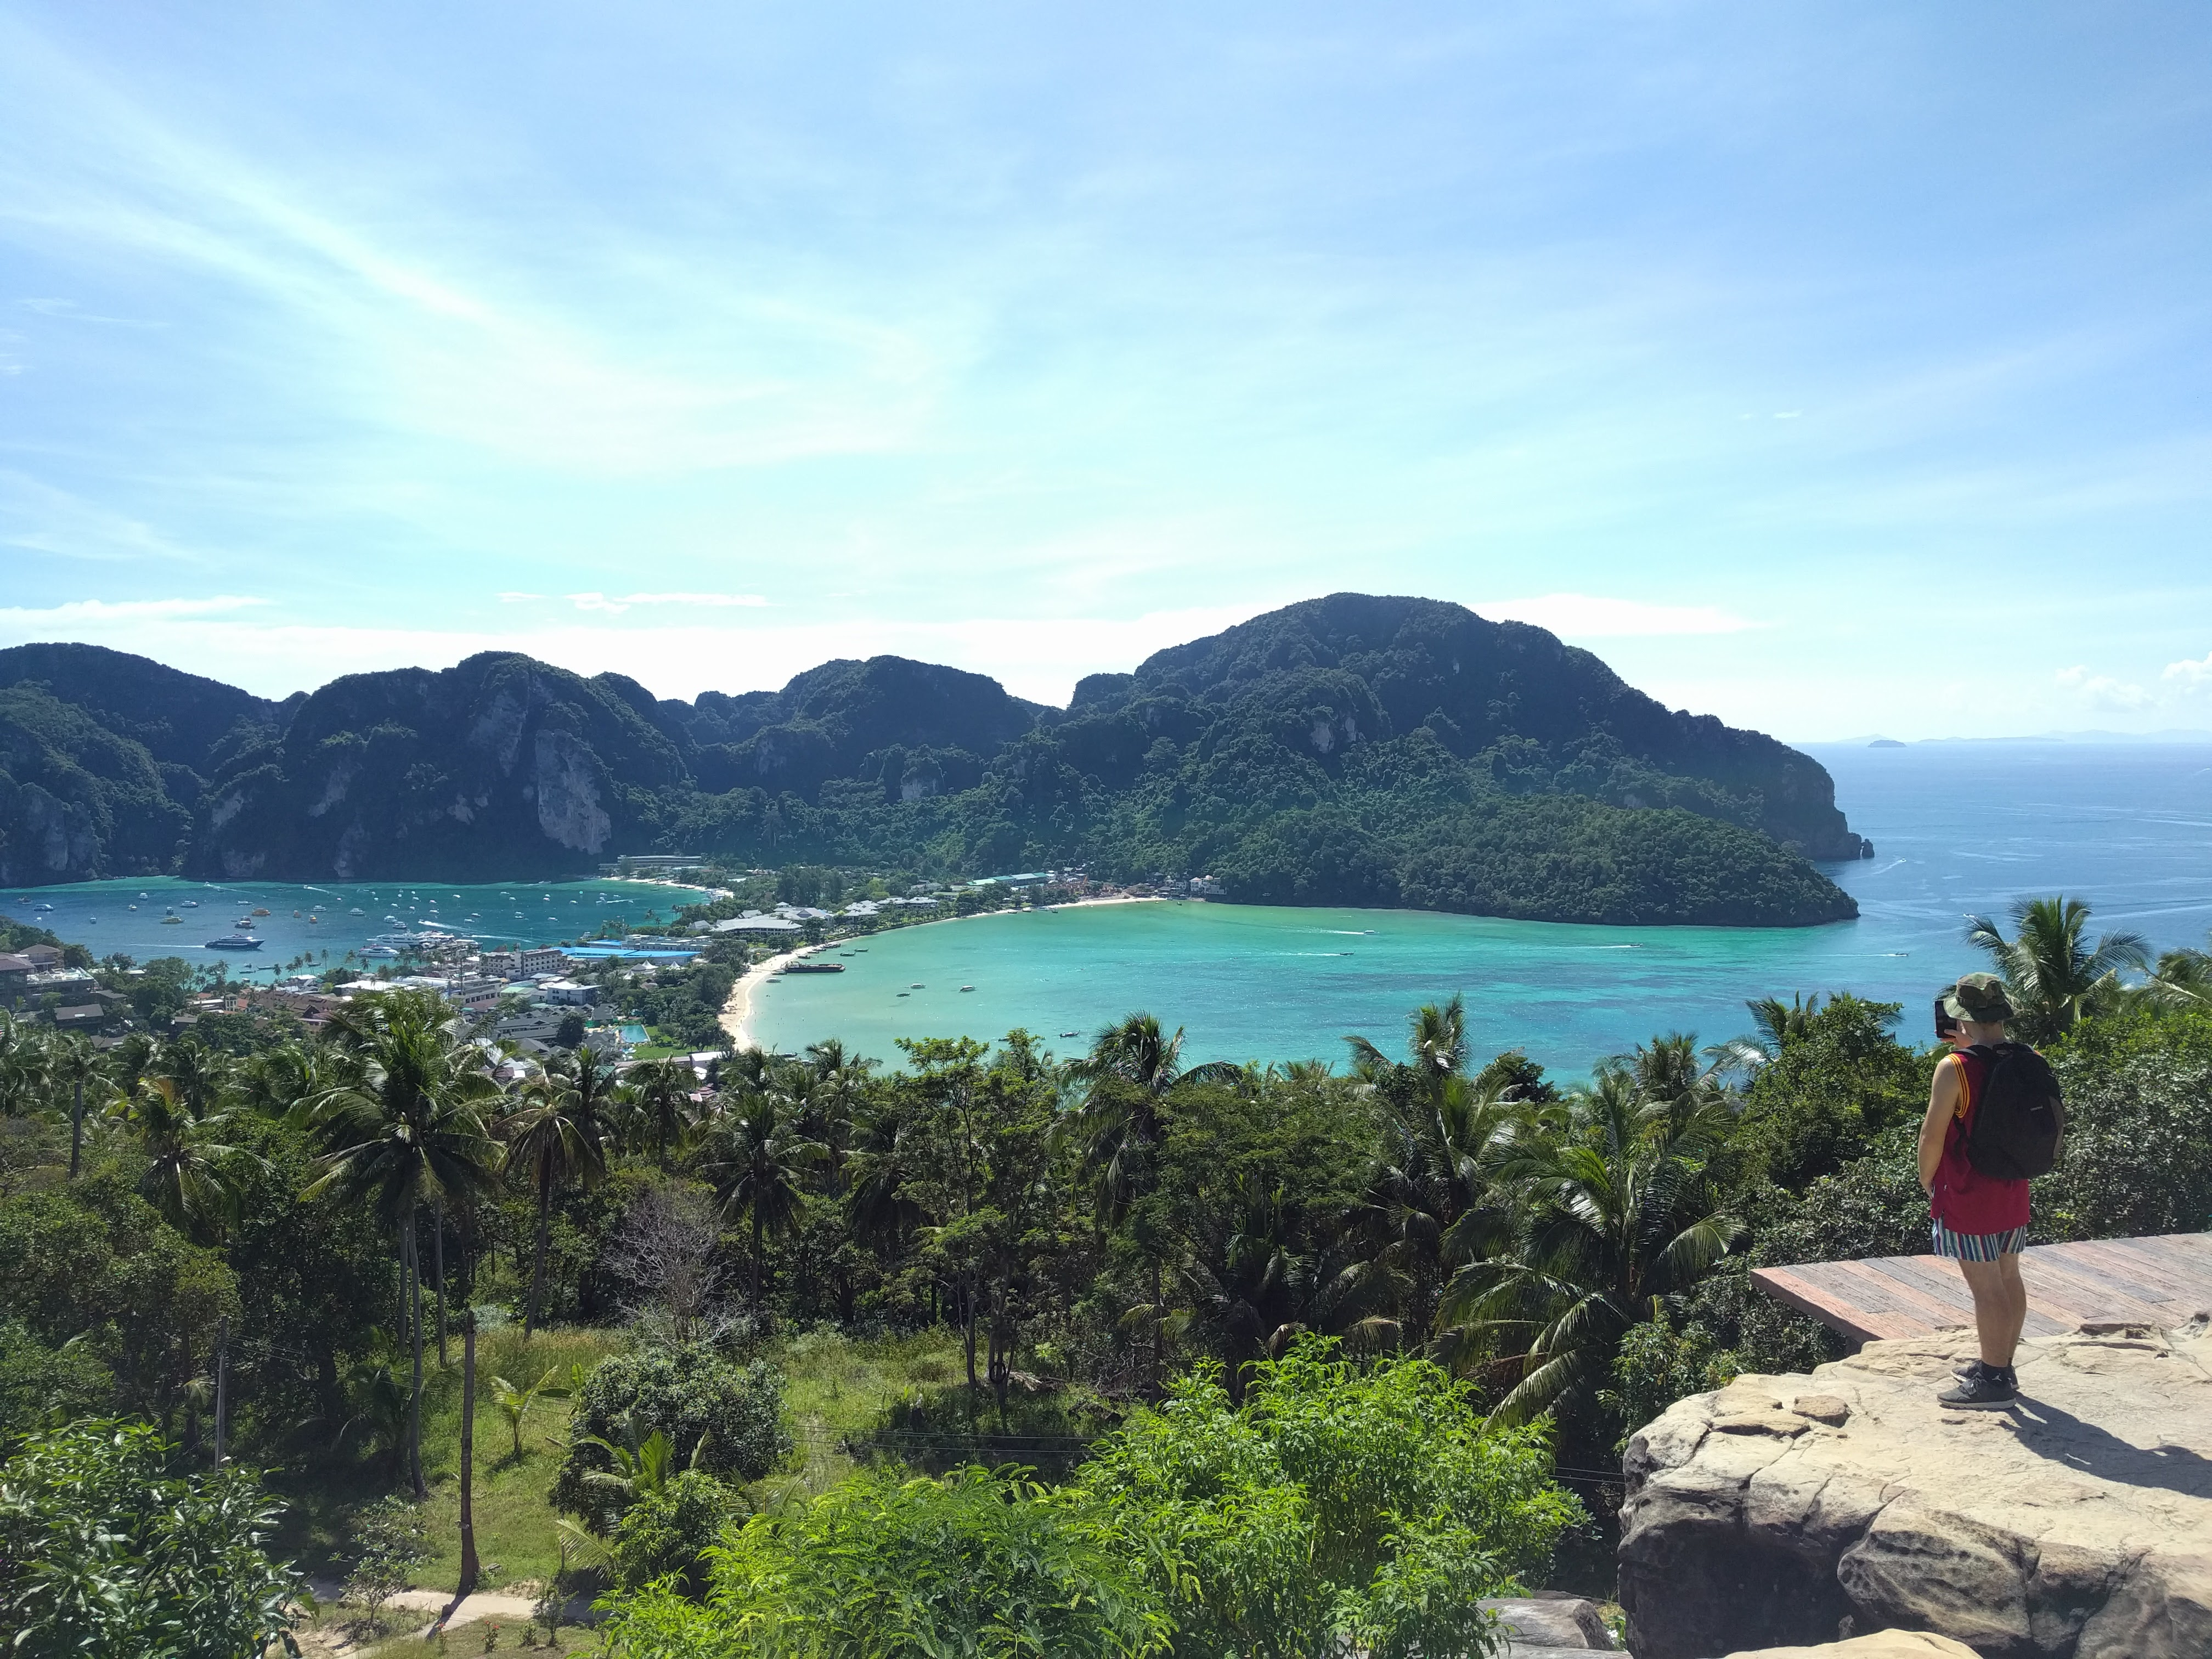 Koh Phi Phi Phuket